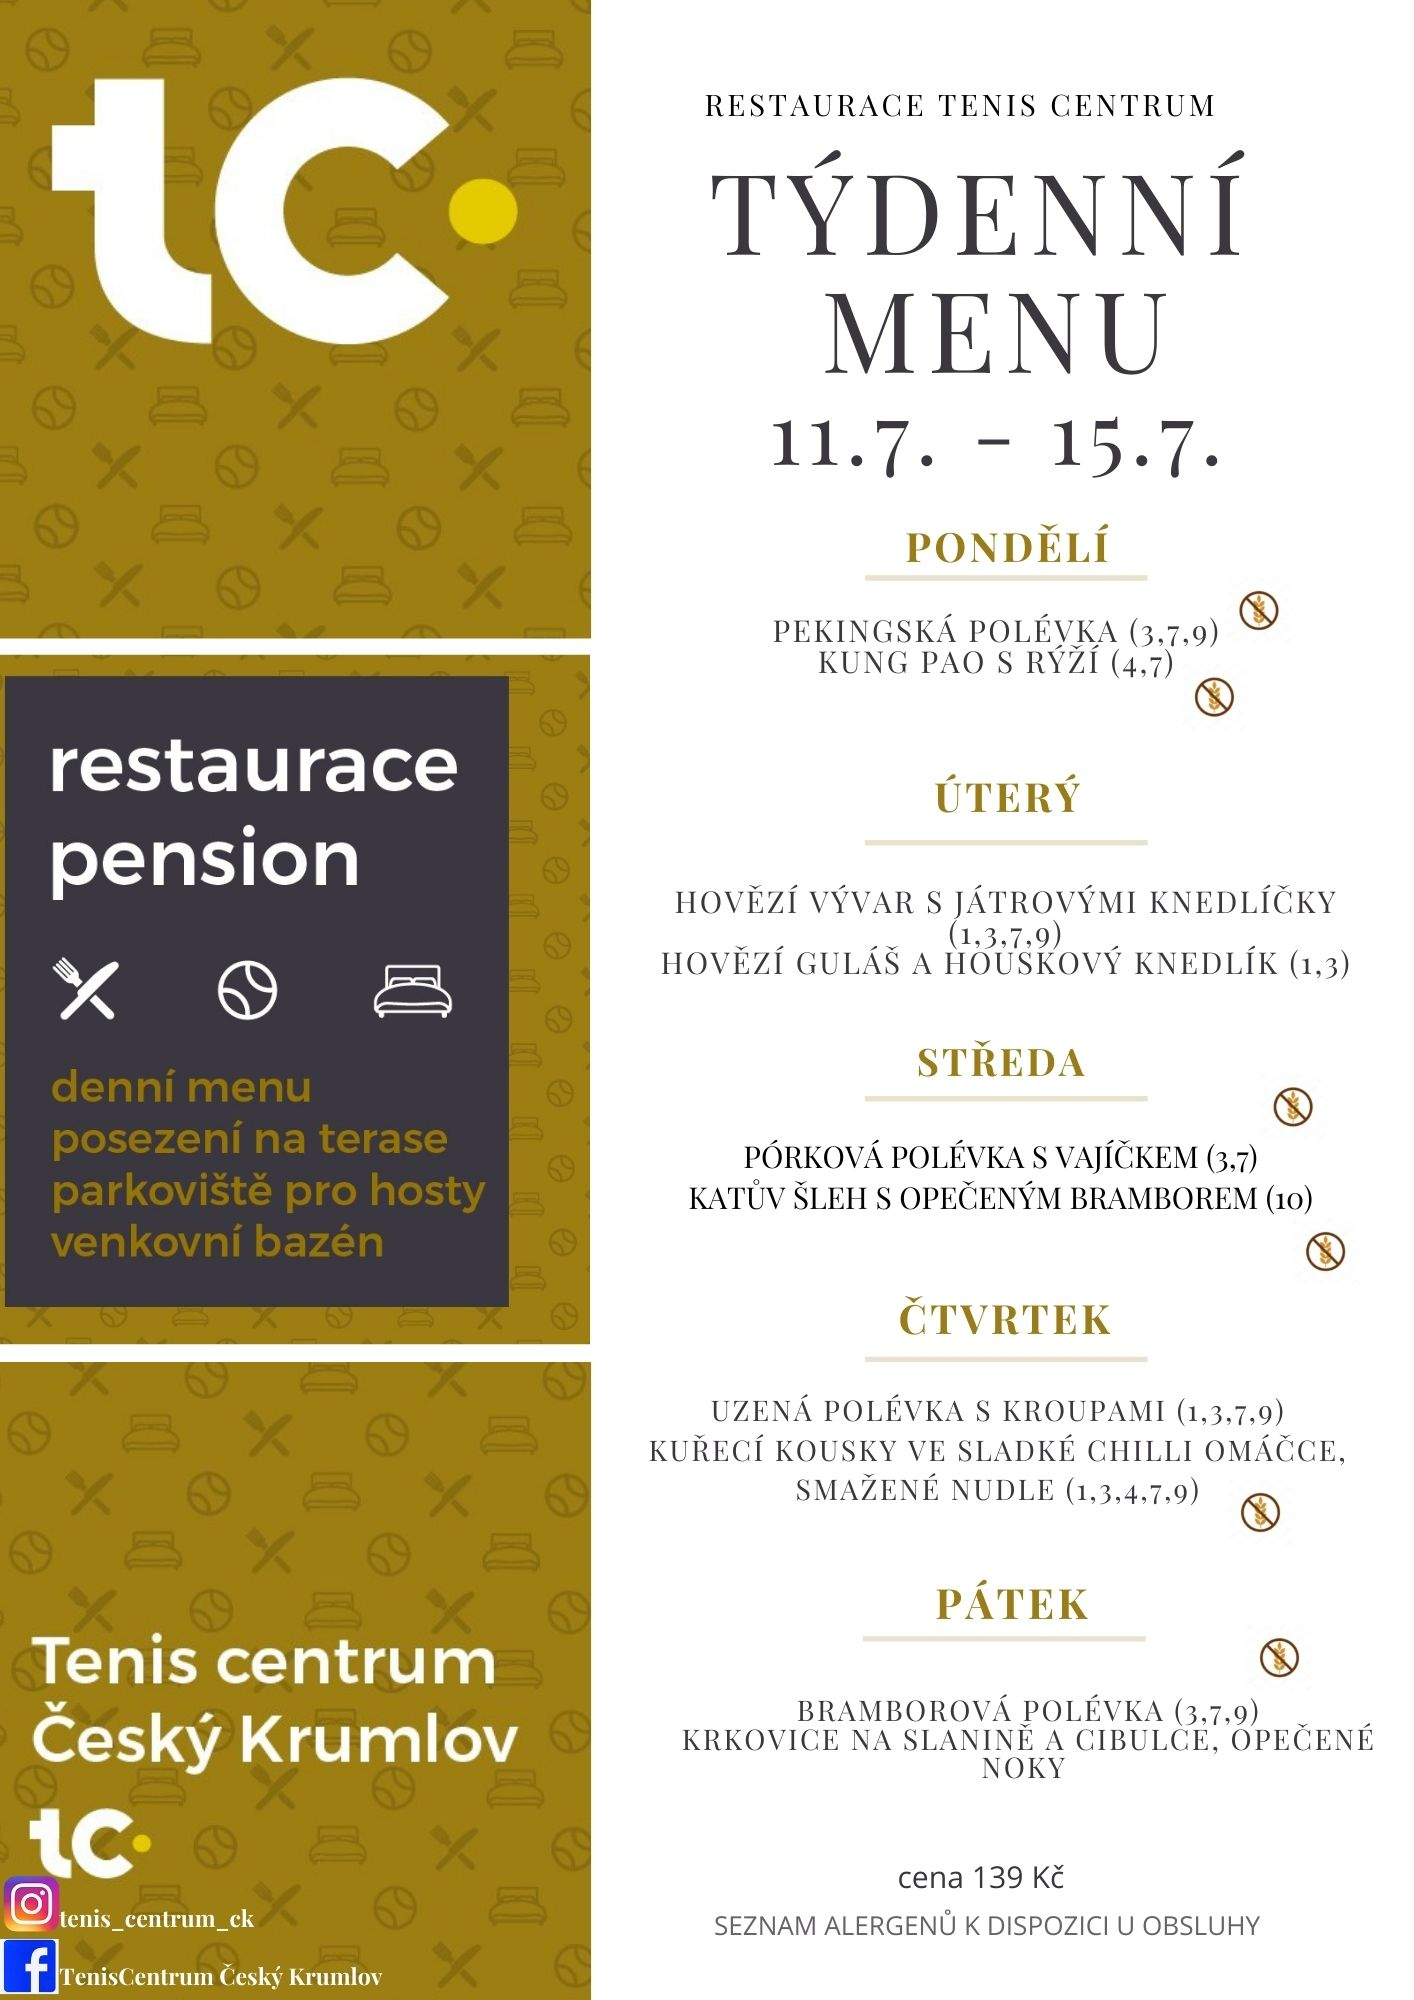 Týdenní menu Restaurace TenisCentrum